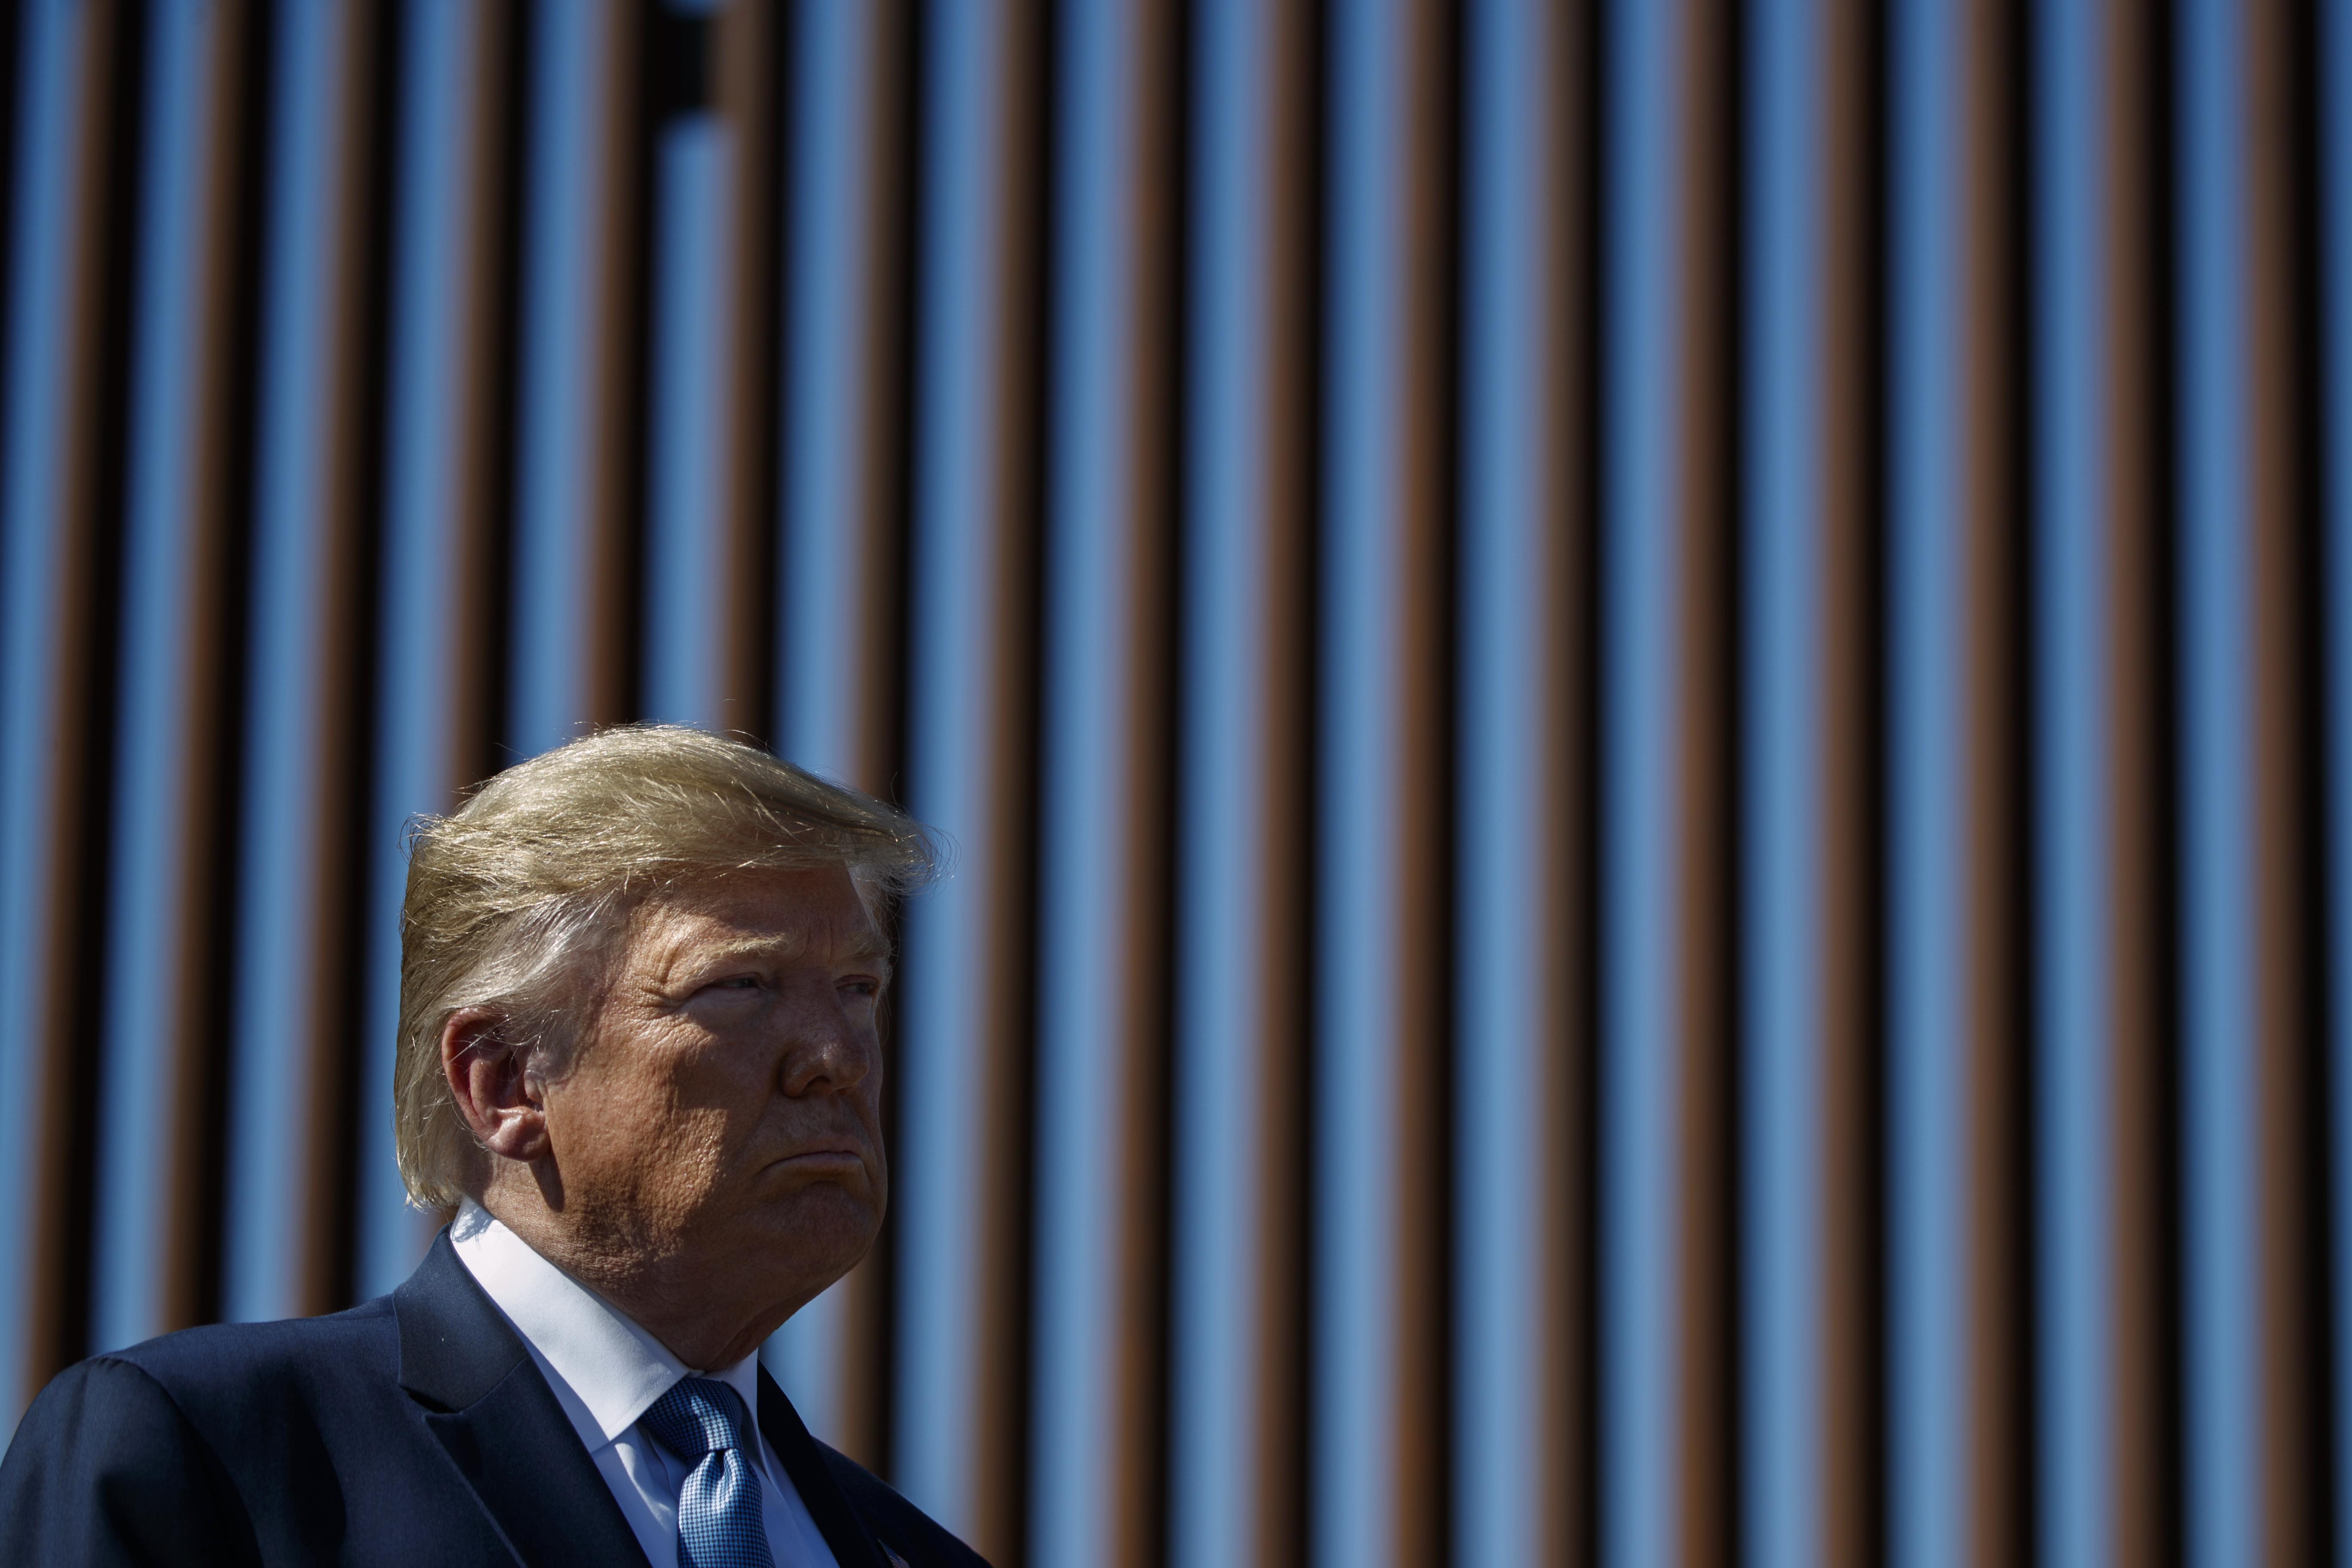 Trump used anti-Taliban funds to build border wall: Democrats